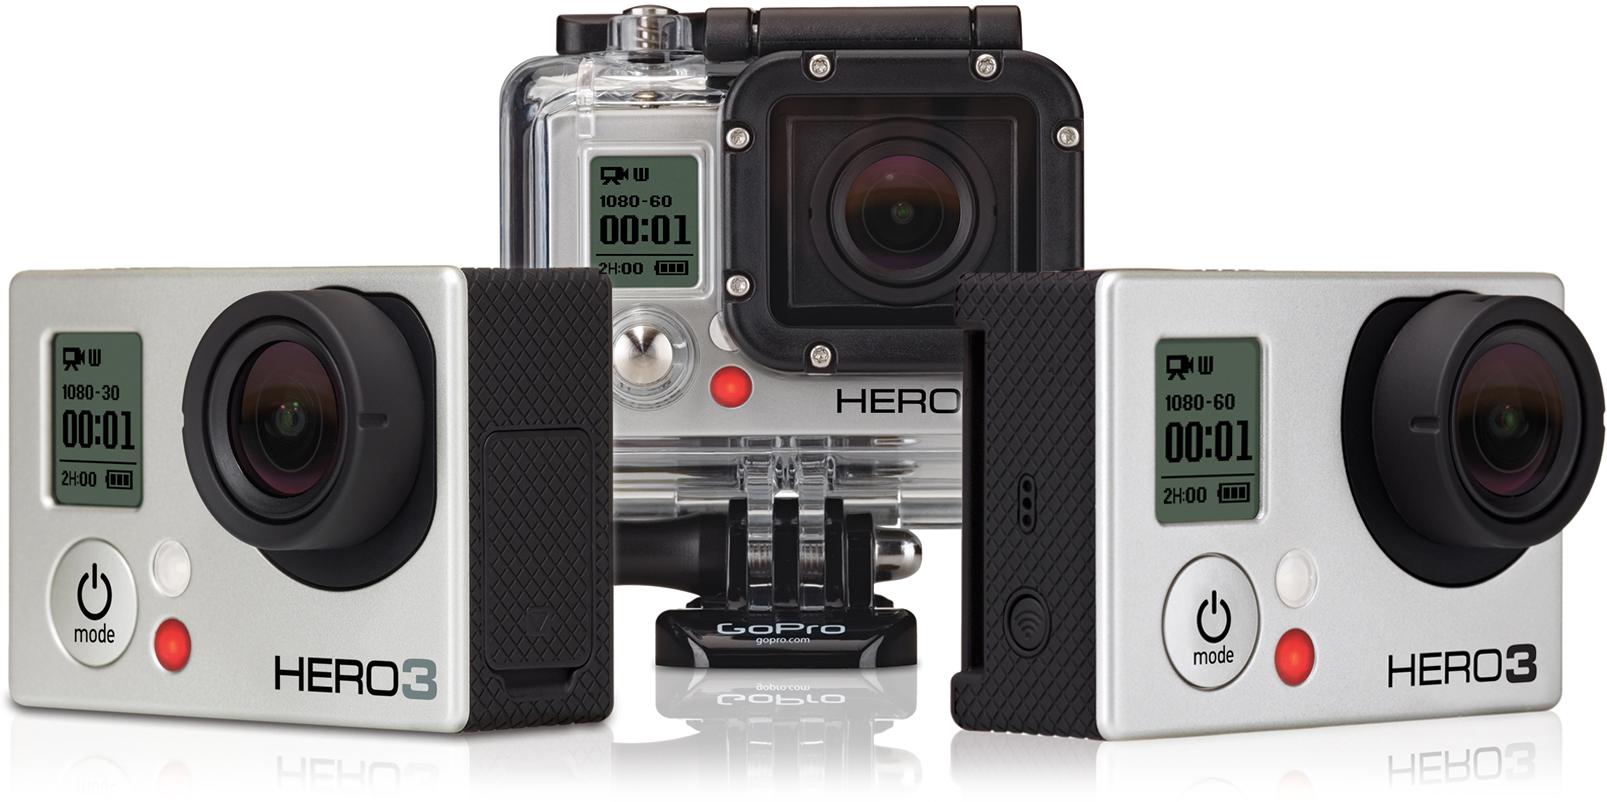 GoPro Announces the New HERO3 Action Camera & Accessories | B&H Explora